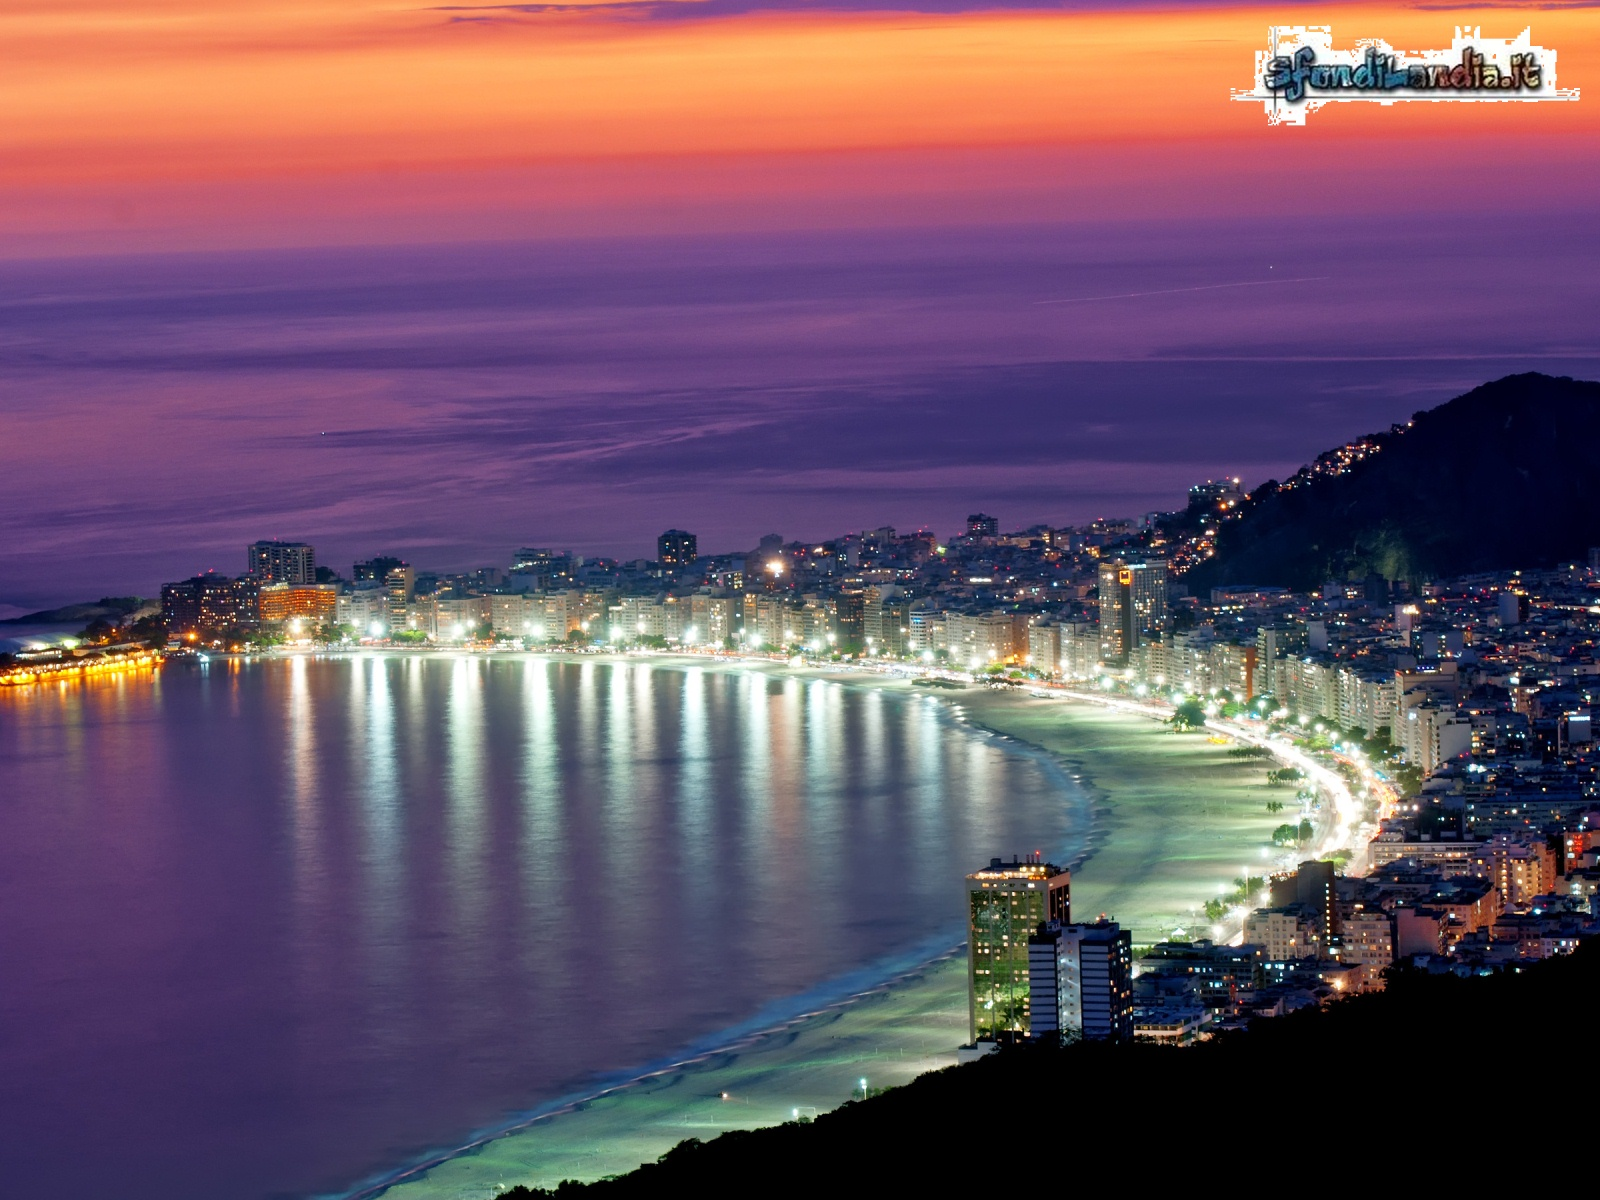 Copacabana in Rio